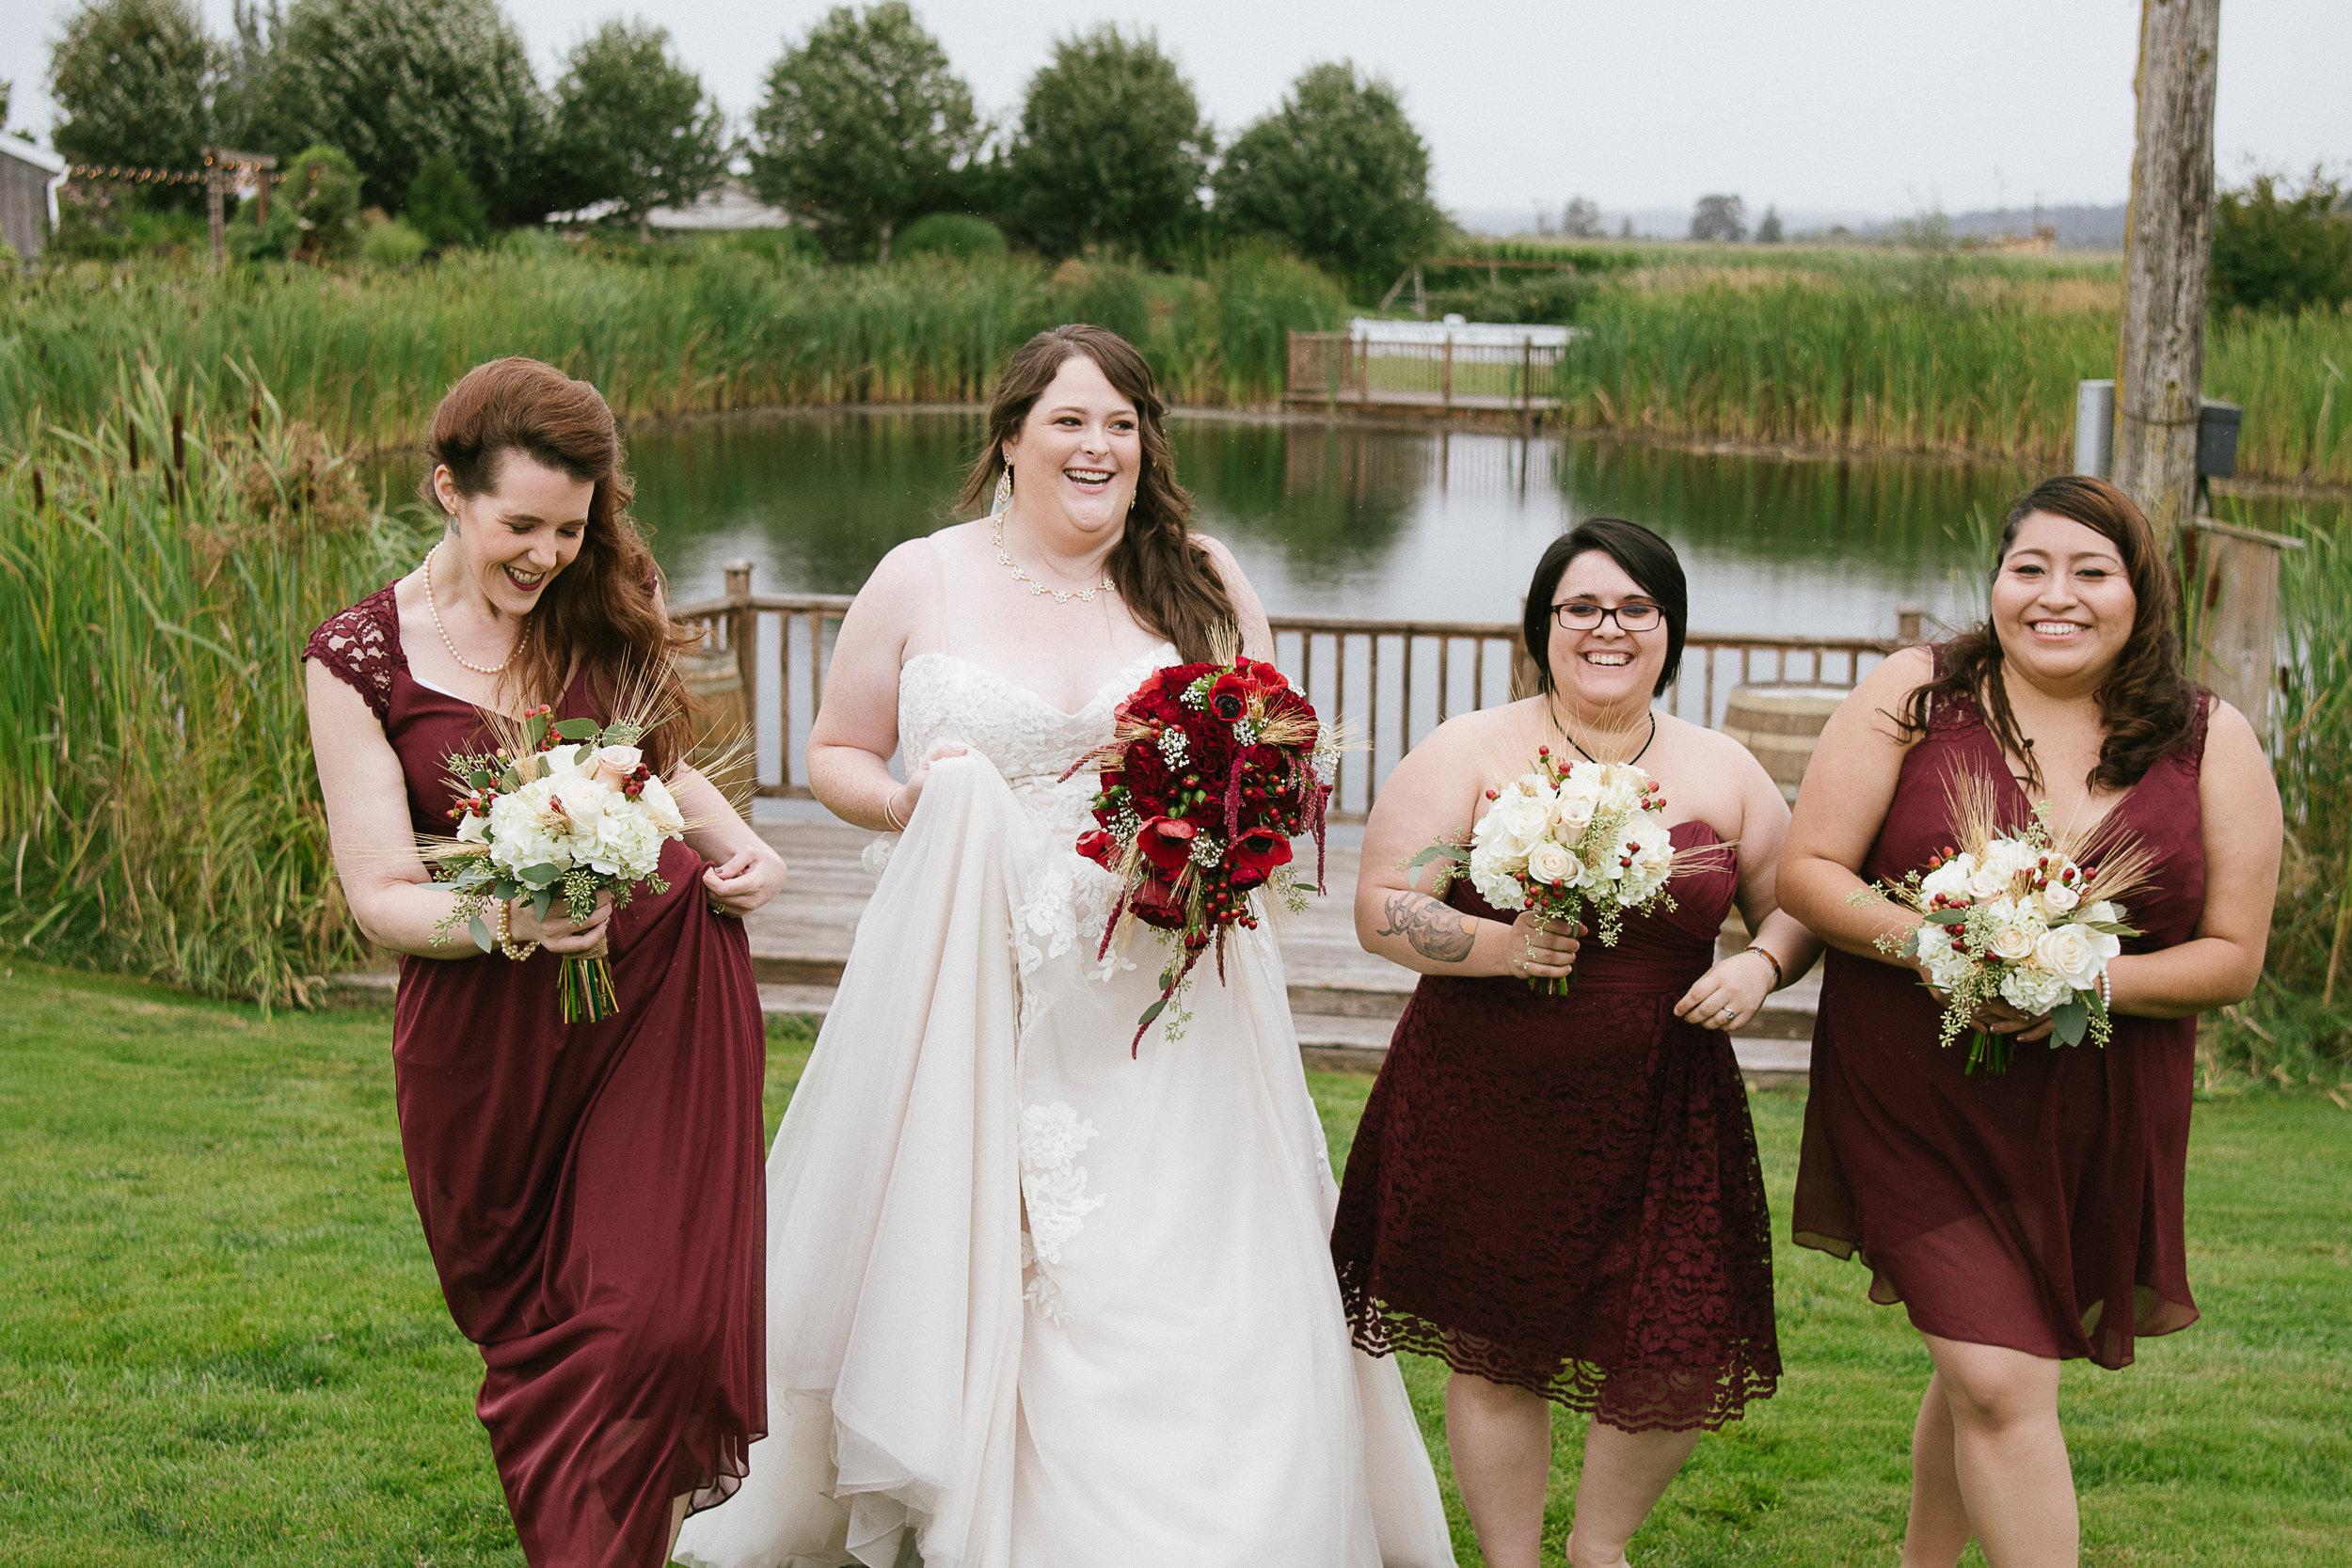 Swan Trail Farm Wedding_Sarah Schurman + Brian Skadan_Snohomish Wedding_Kelsey Lane Photography-6290-2.jpg